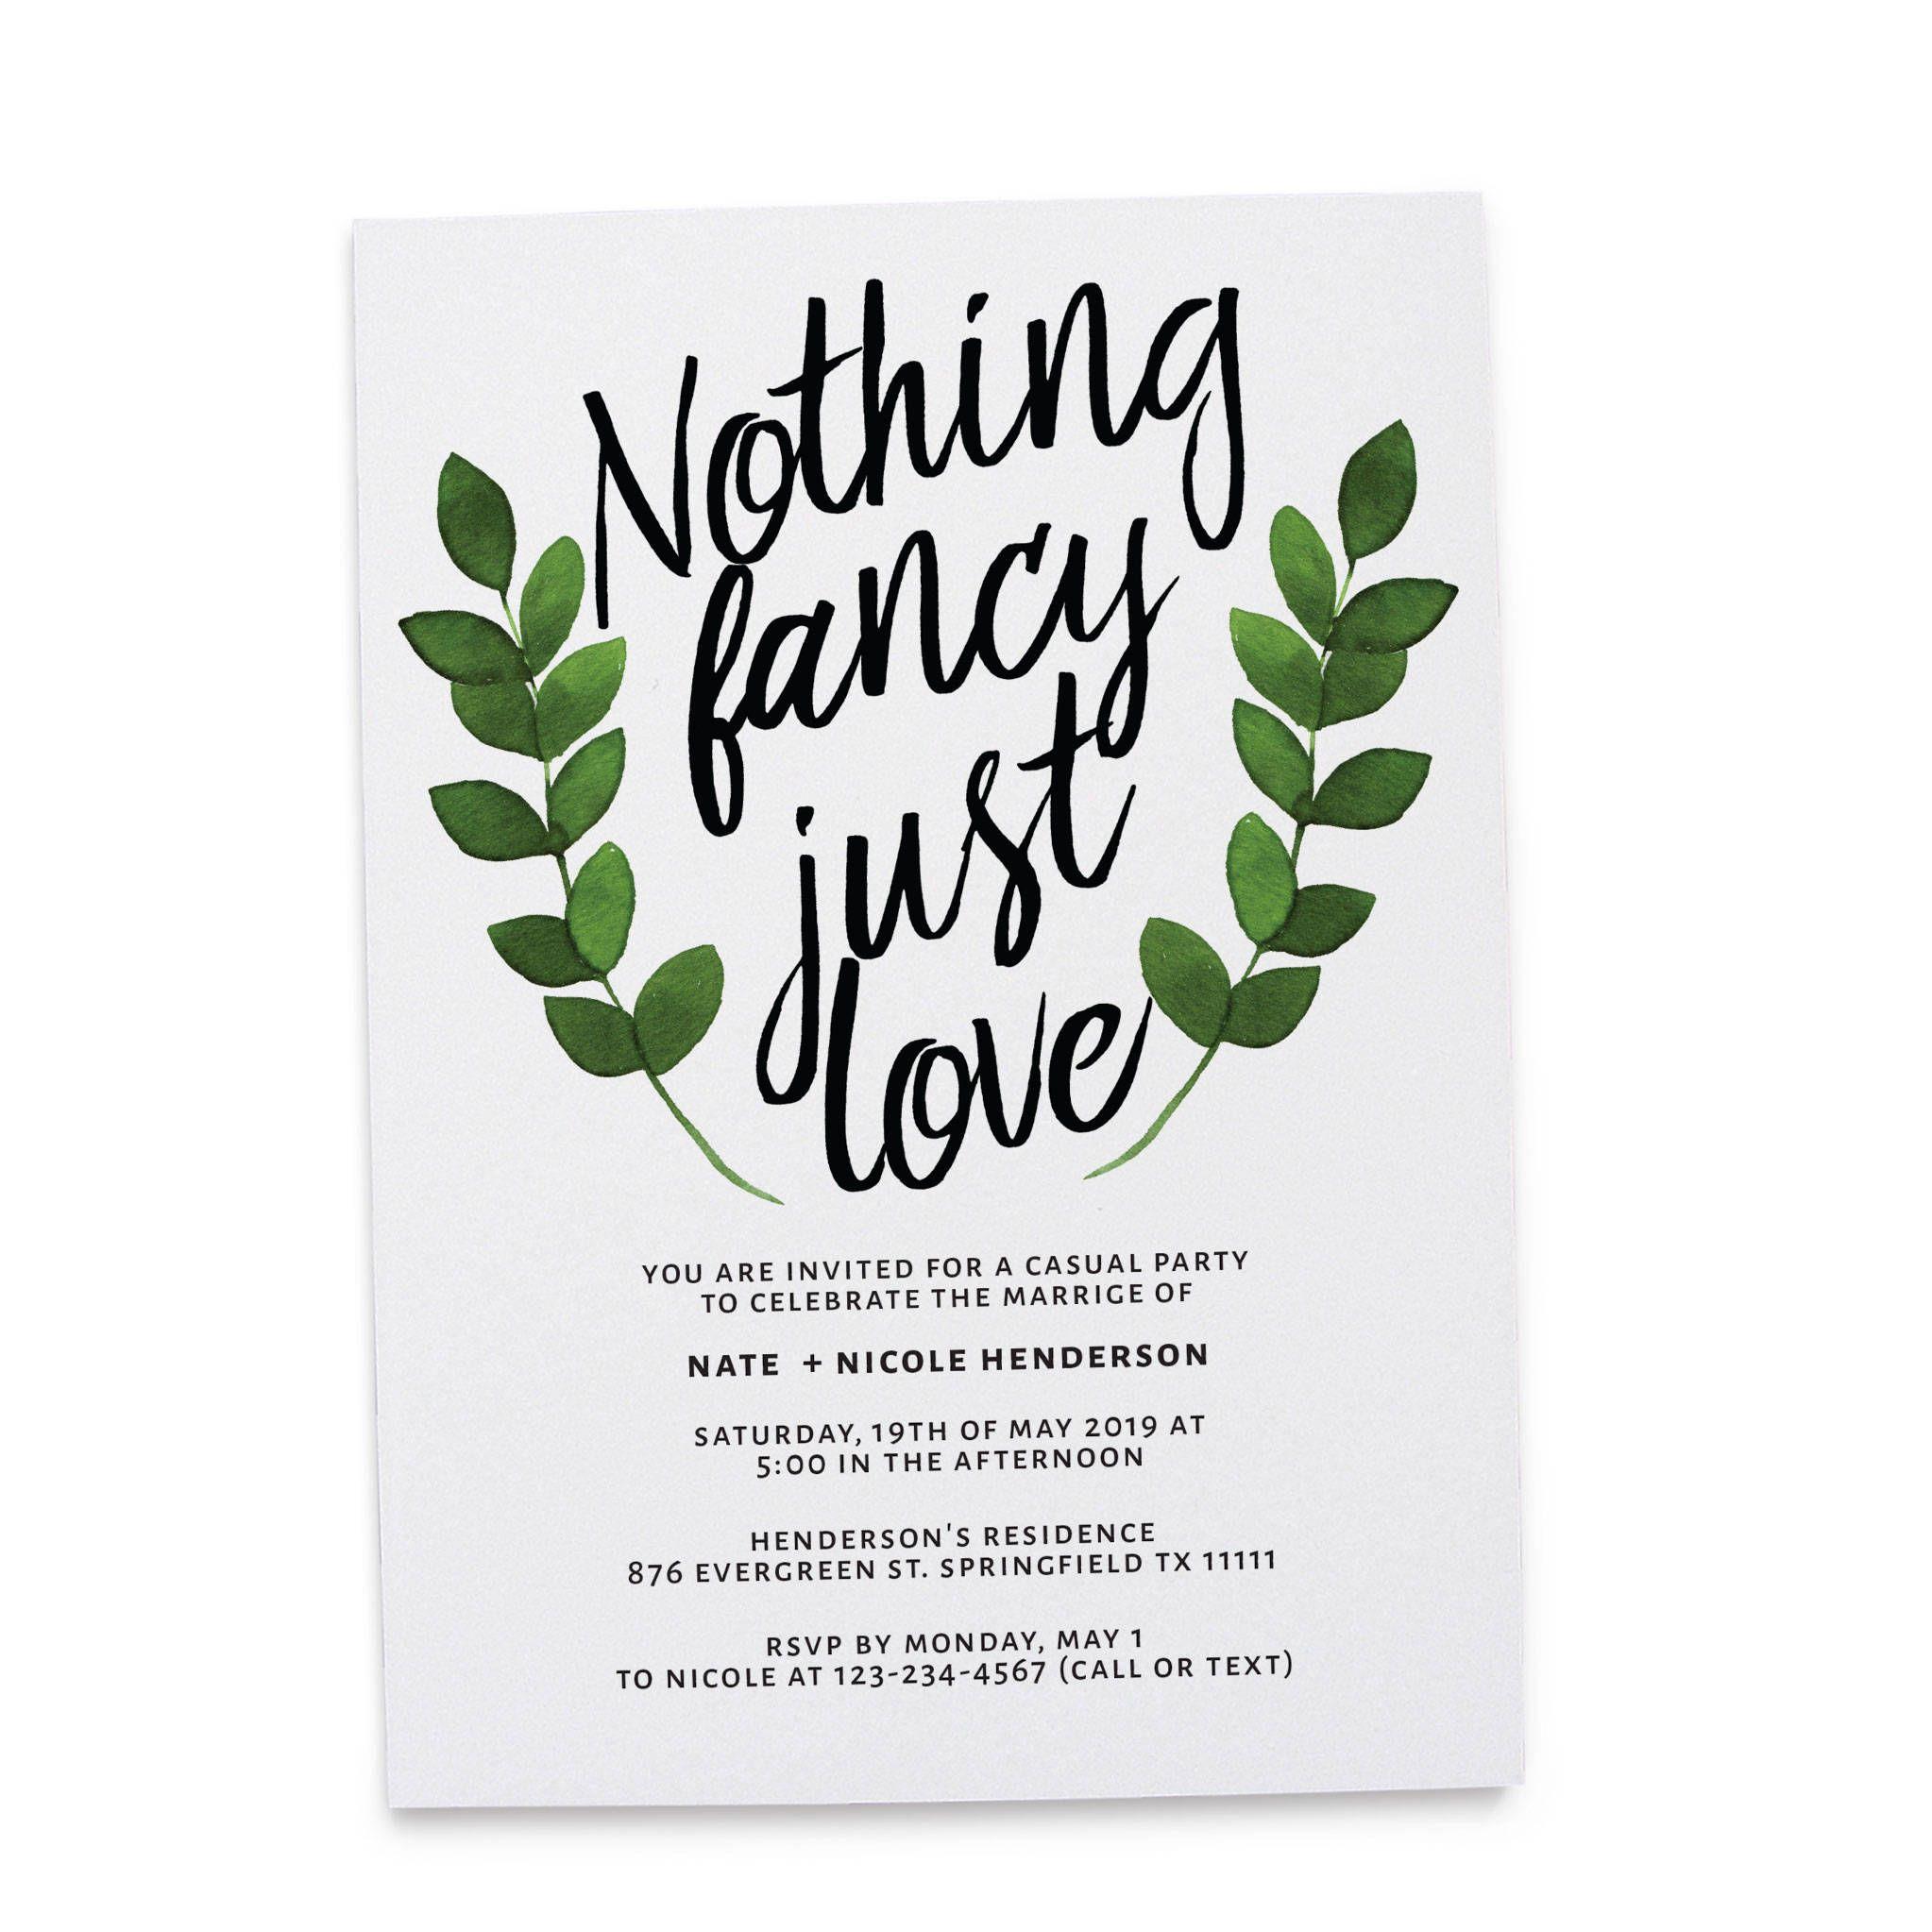 75 Fun Unique Wedding Invitations For Cool Couples Emmaline Bride Casual Wedding Reception Funny Wedding Invitations Wedding Invitation Wording Casual